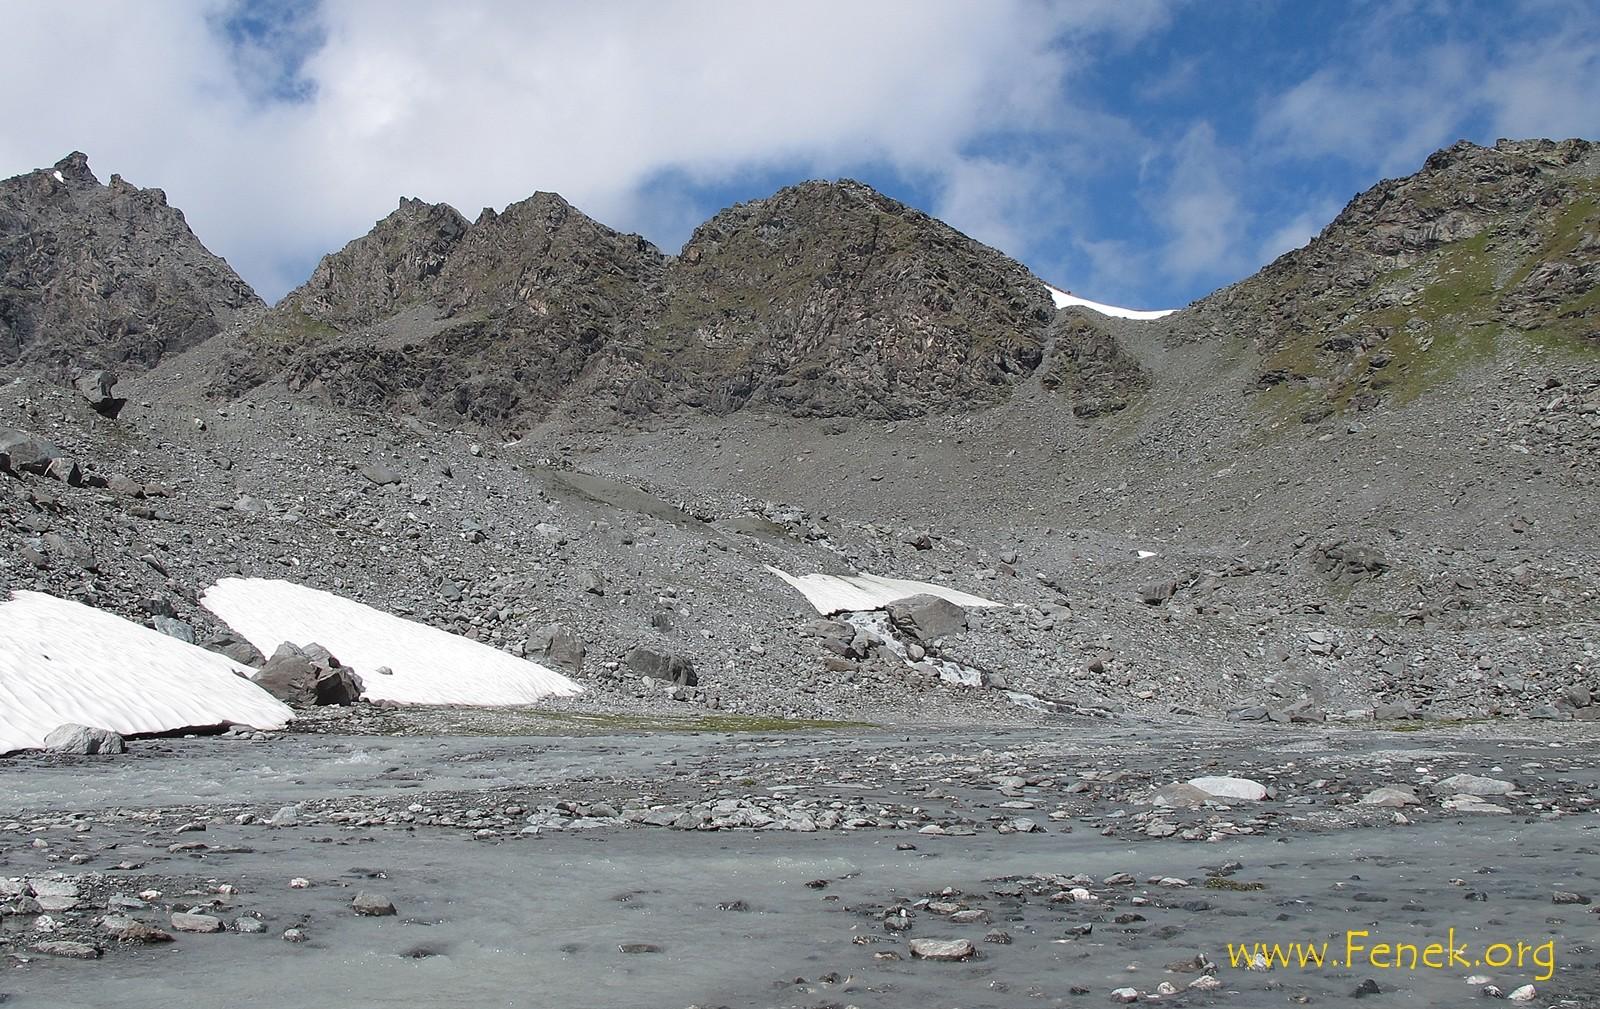 wo der Schnee liegt - Col de Prafleuri